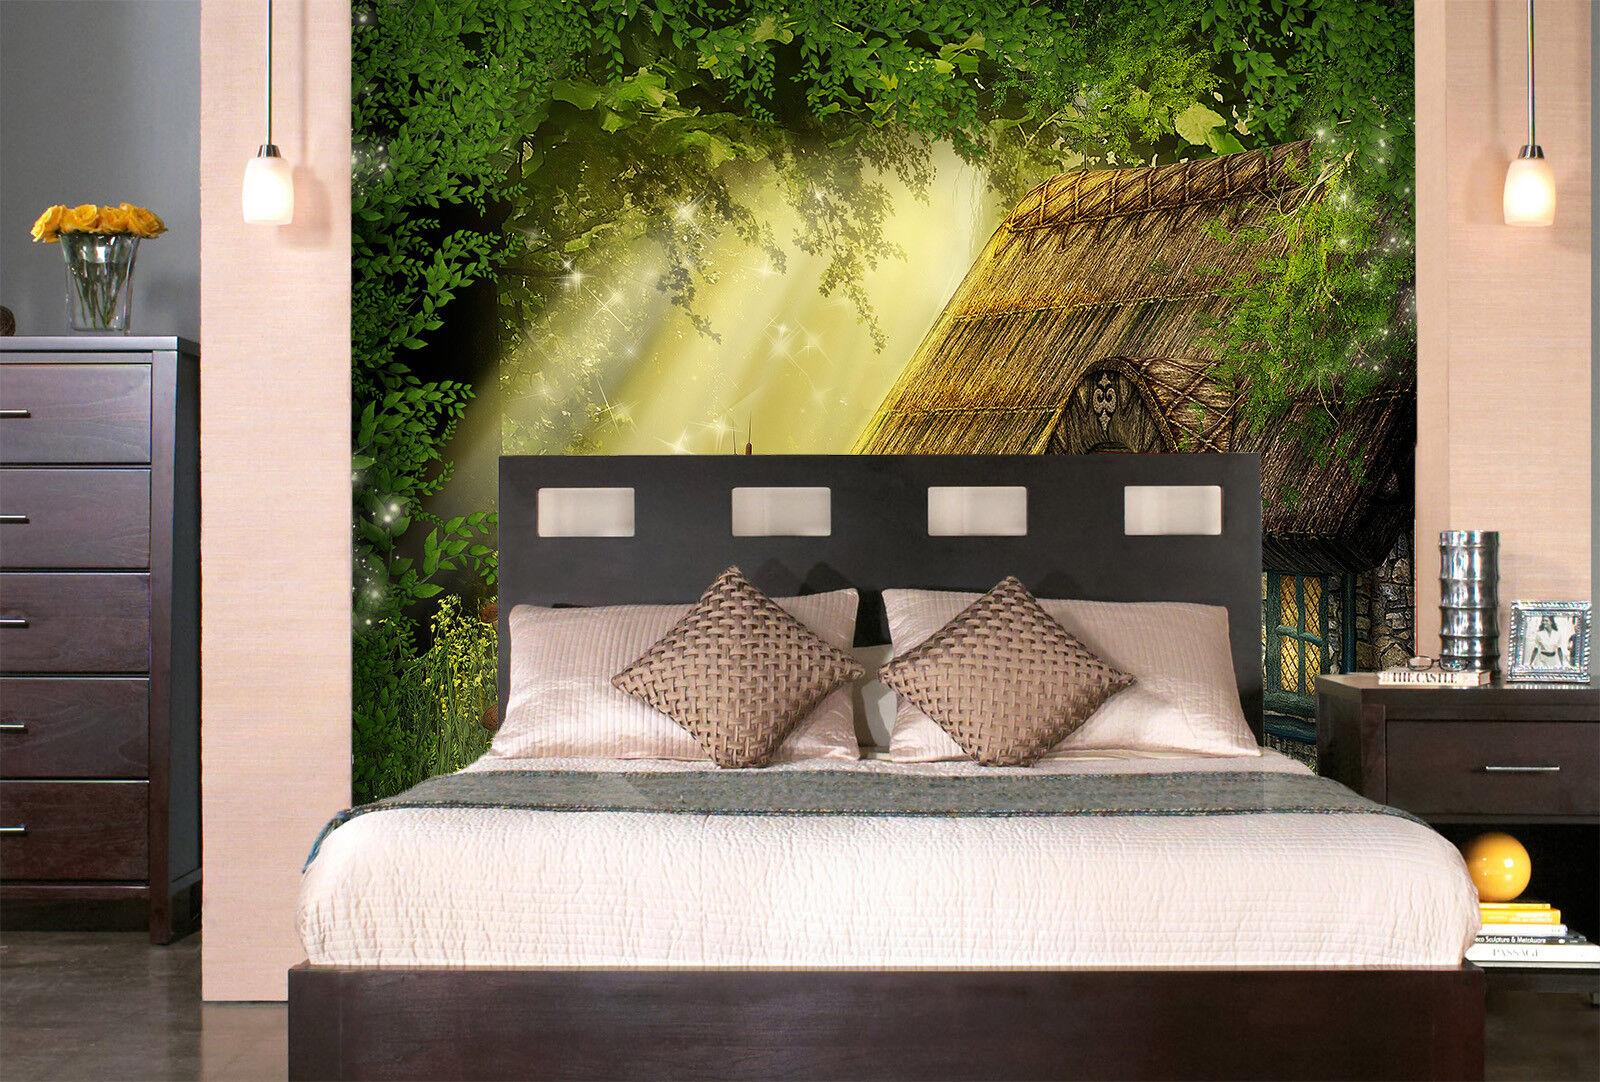 3D Sonnenschein Pilze Haus 83 Tapete Wandgemälde Tapete Tapeten Bild Familie DE